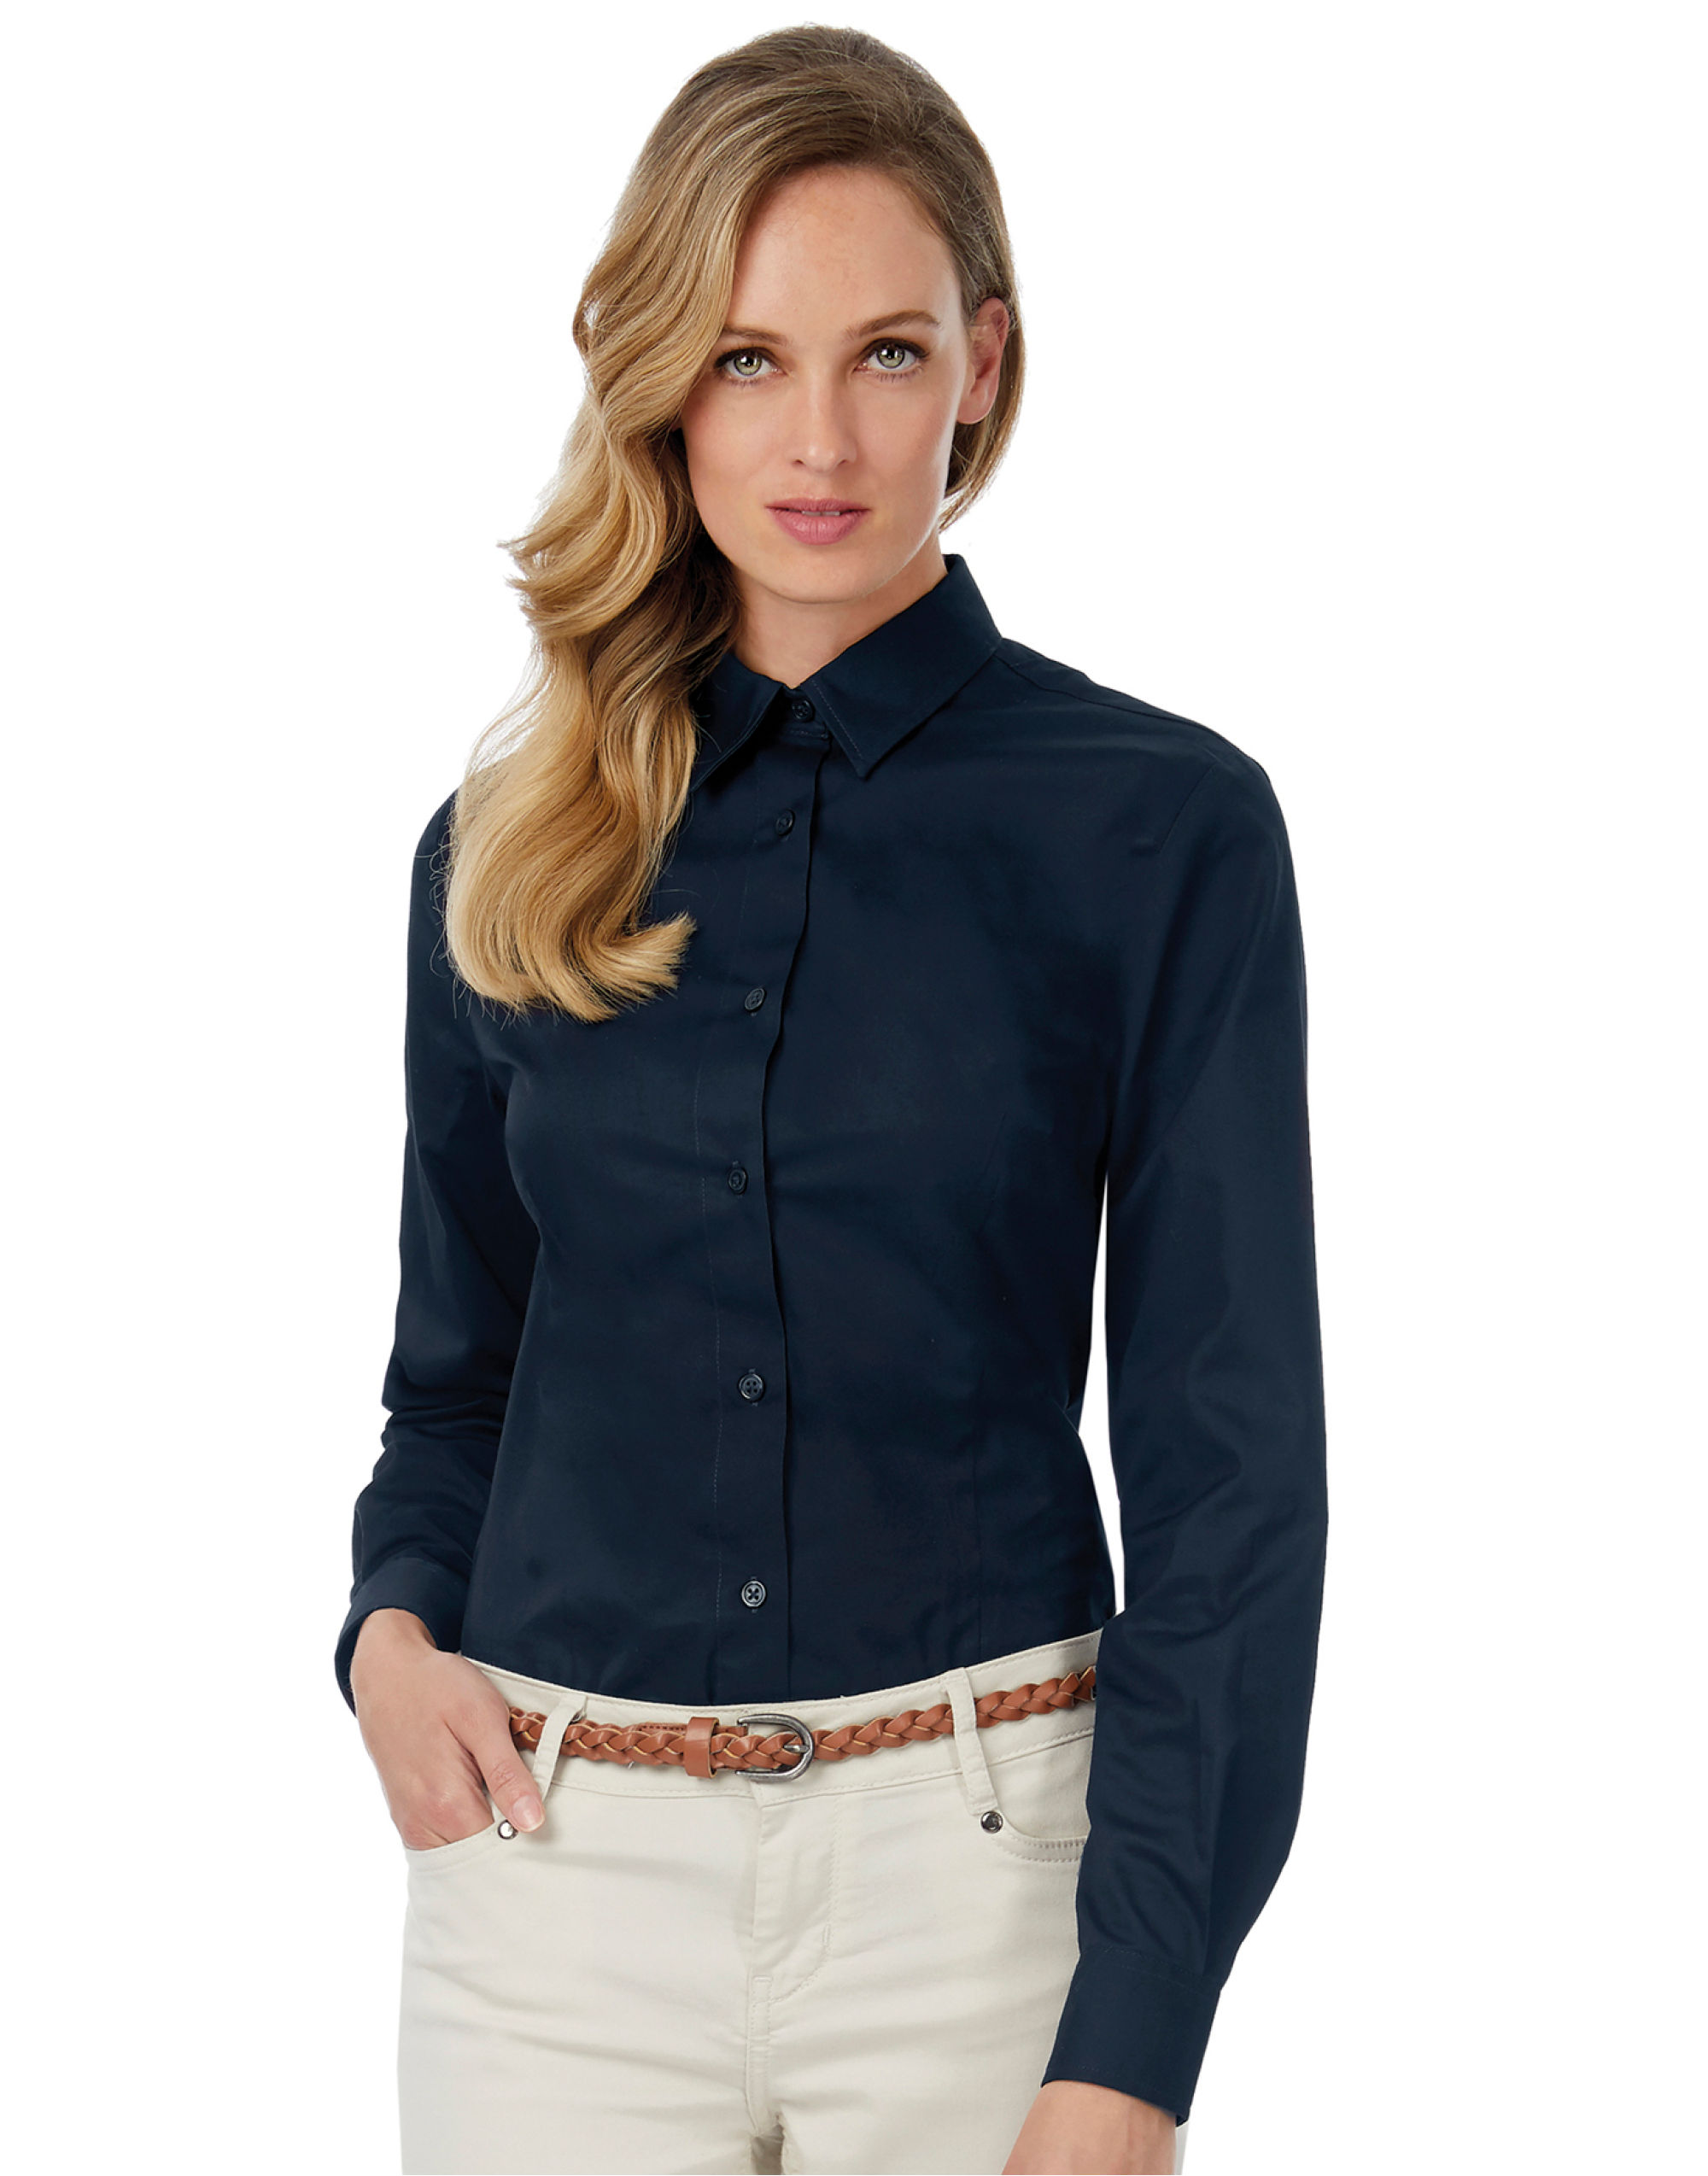 B&C Women's Sharp Twill Long Sleeve Shirt